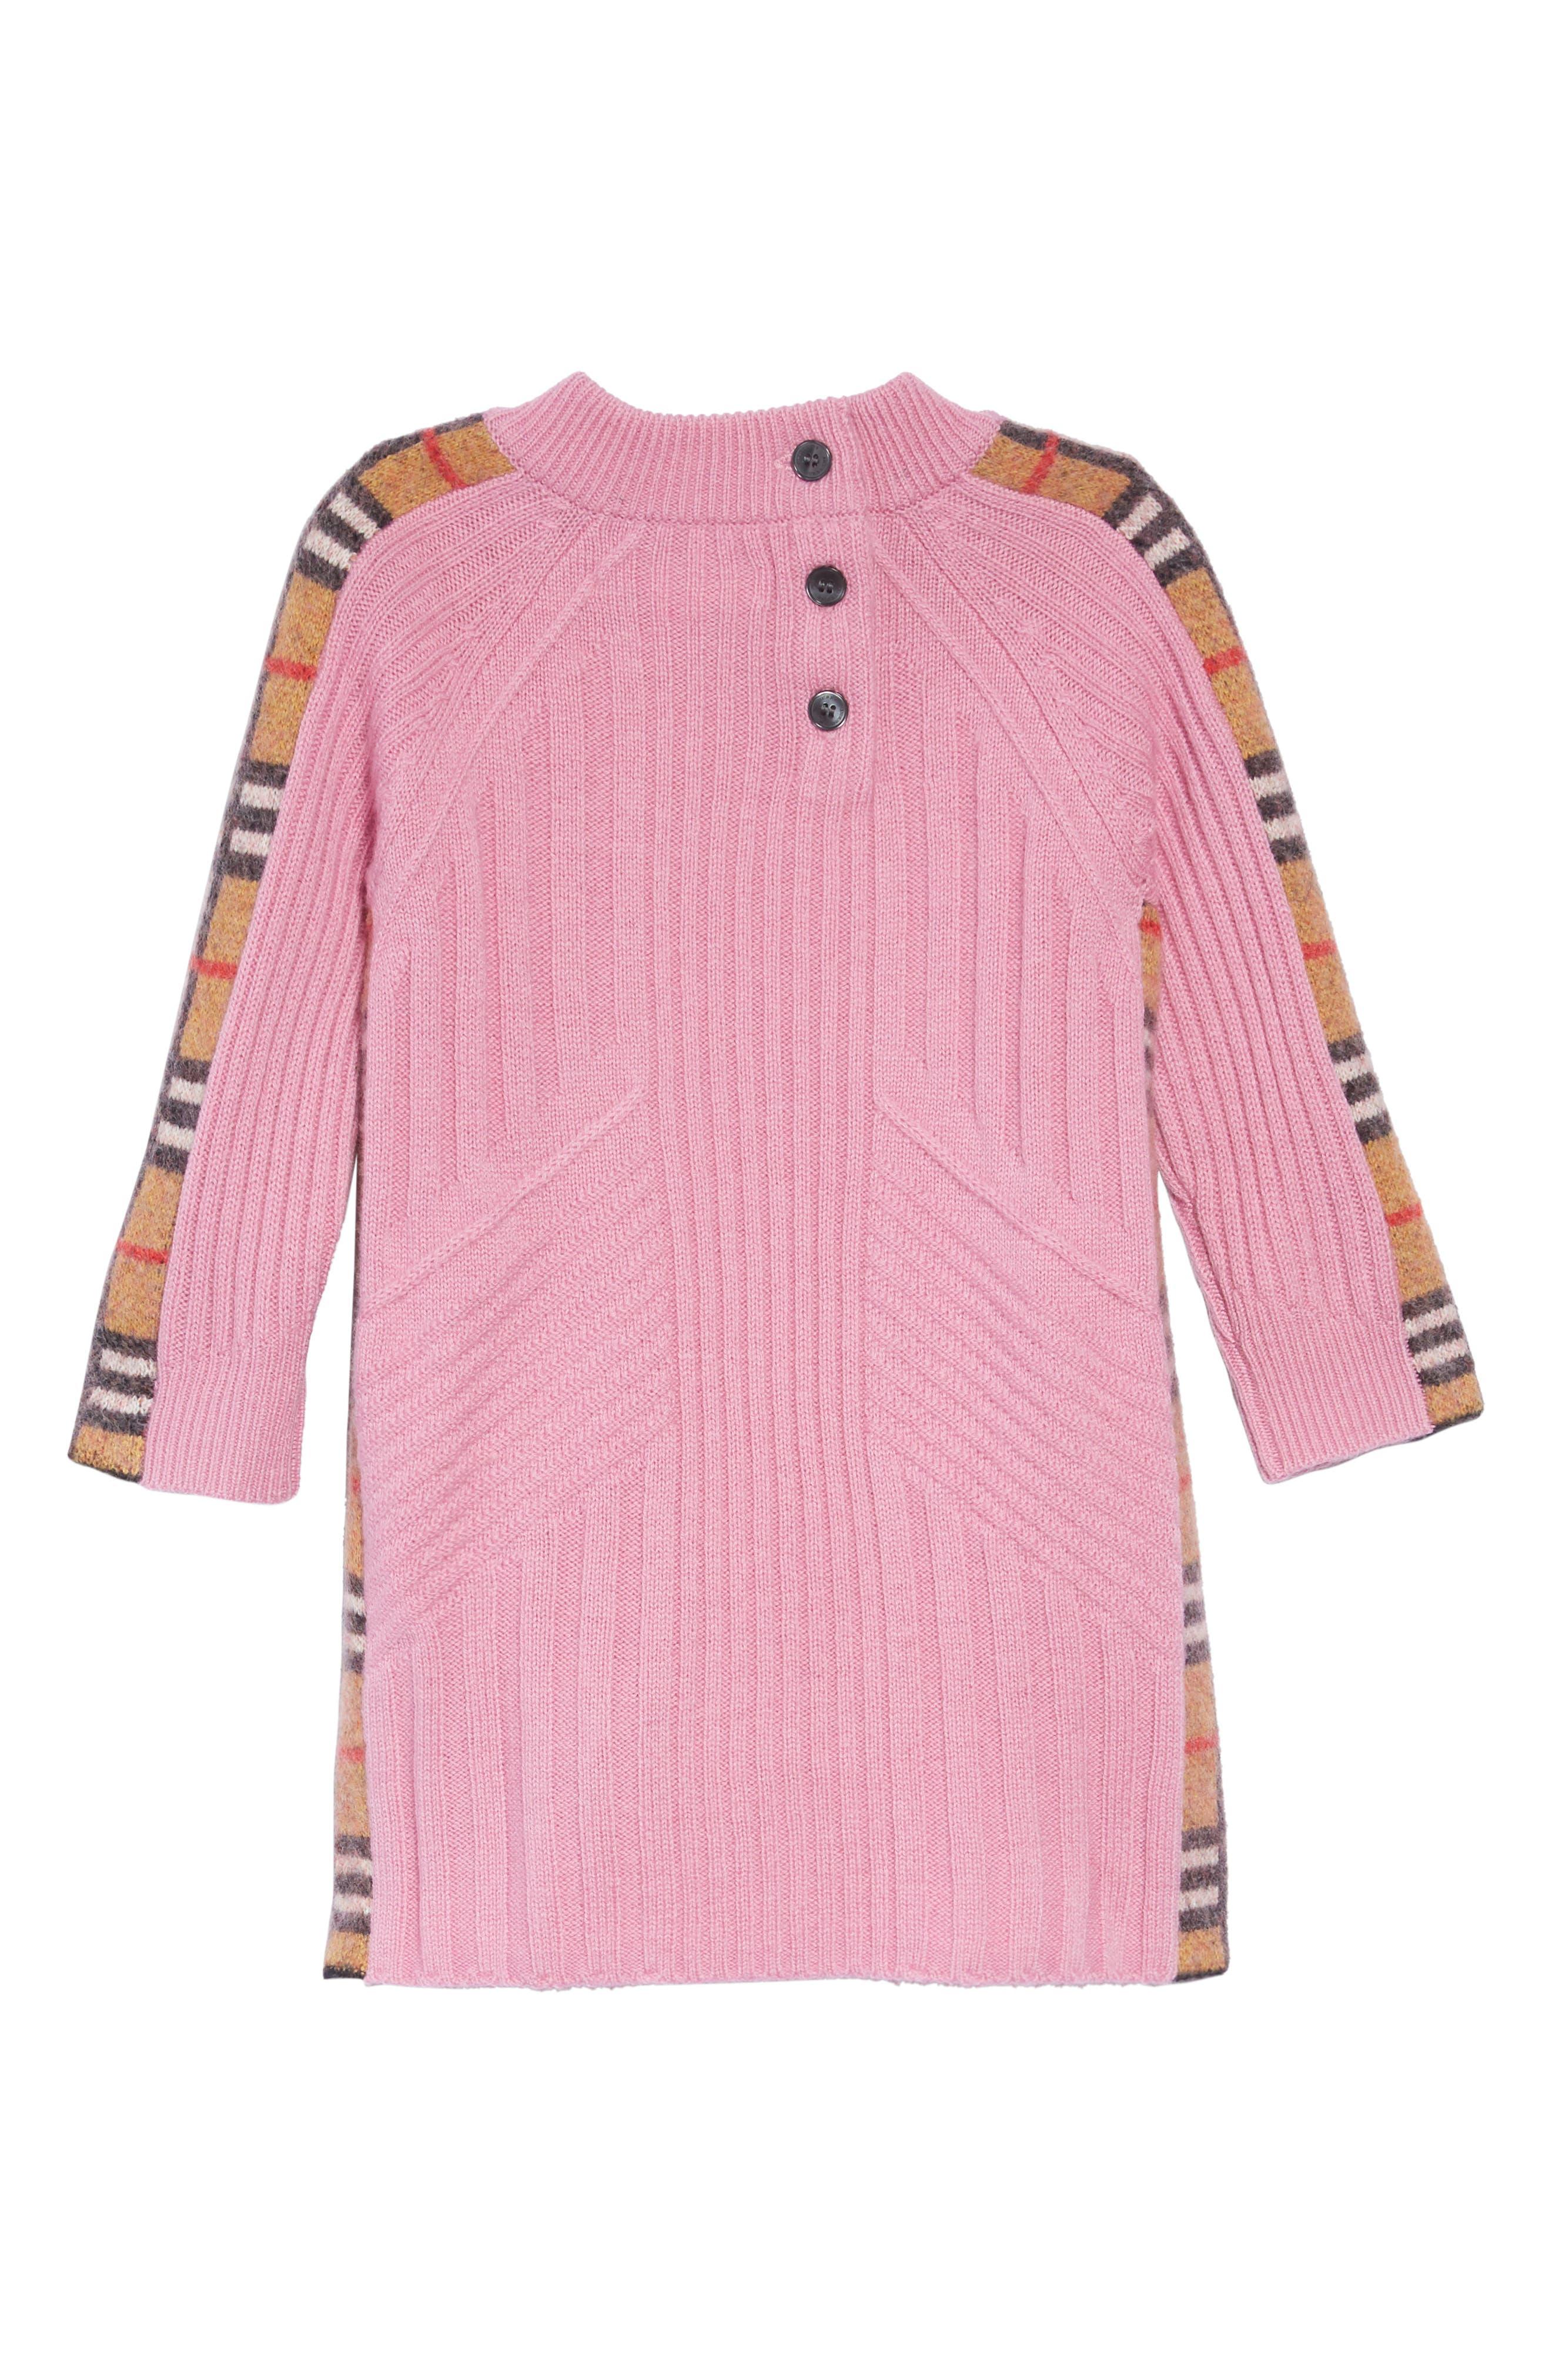 Kids Mini Cathina Check Detail Wool & Cashmere Sweater Dress,                             Alternate thumbnail 2, color,                             ROSE PINK